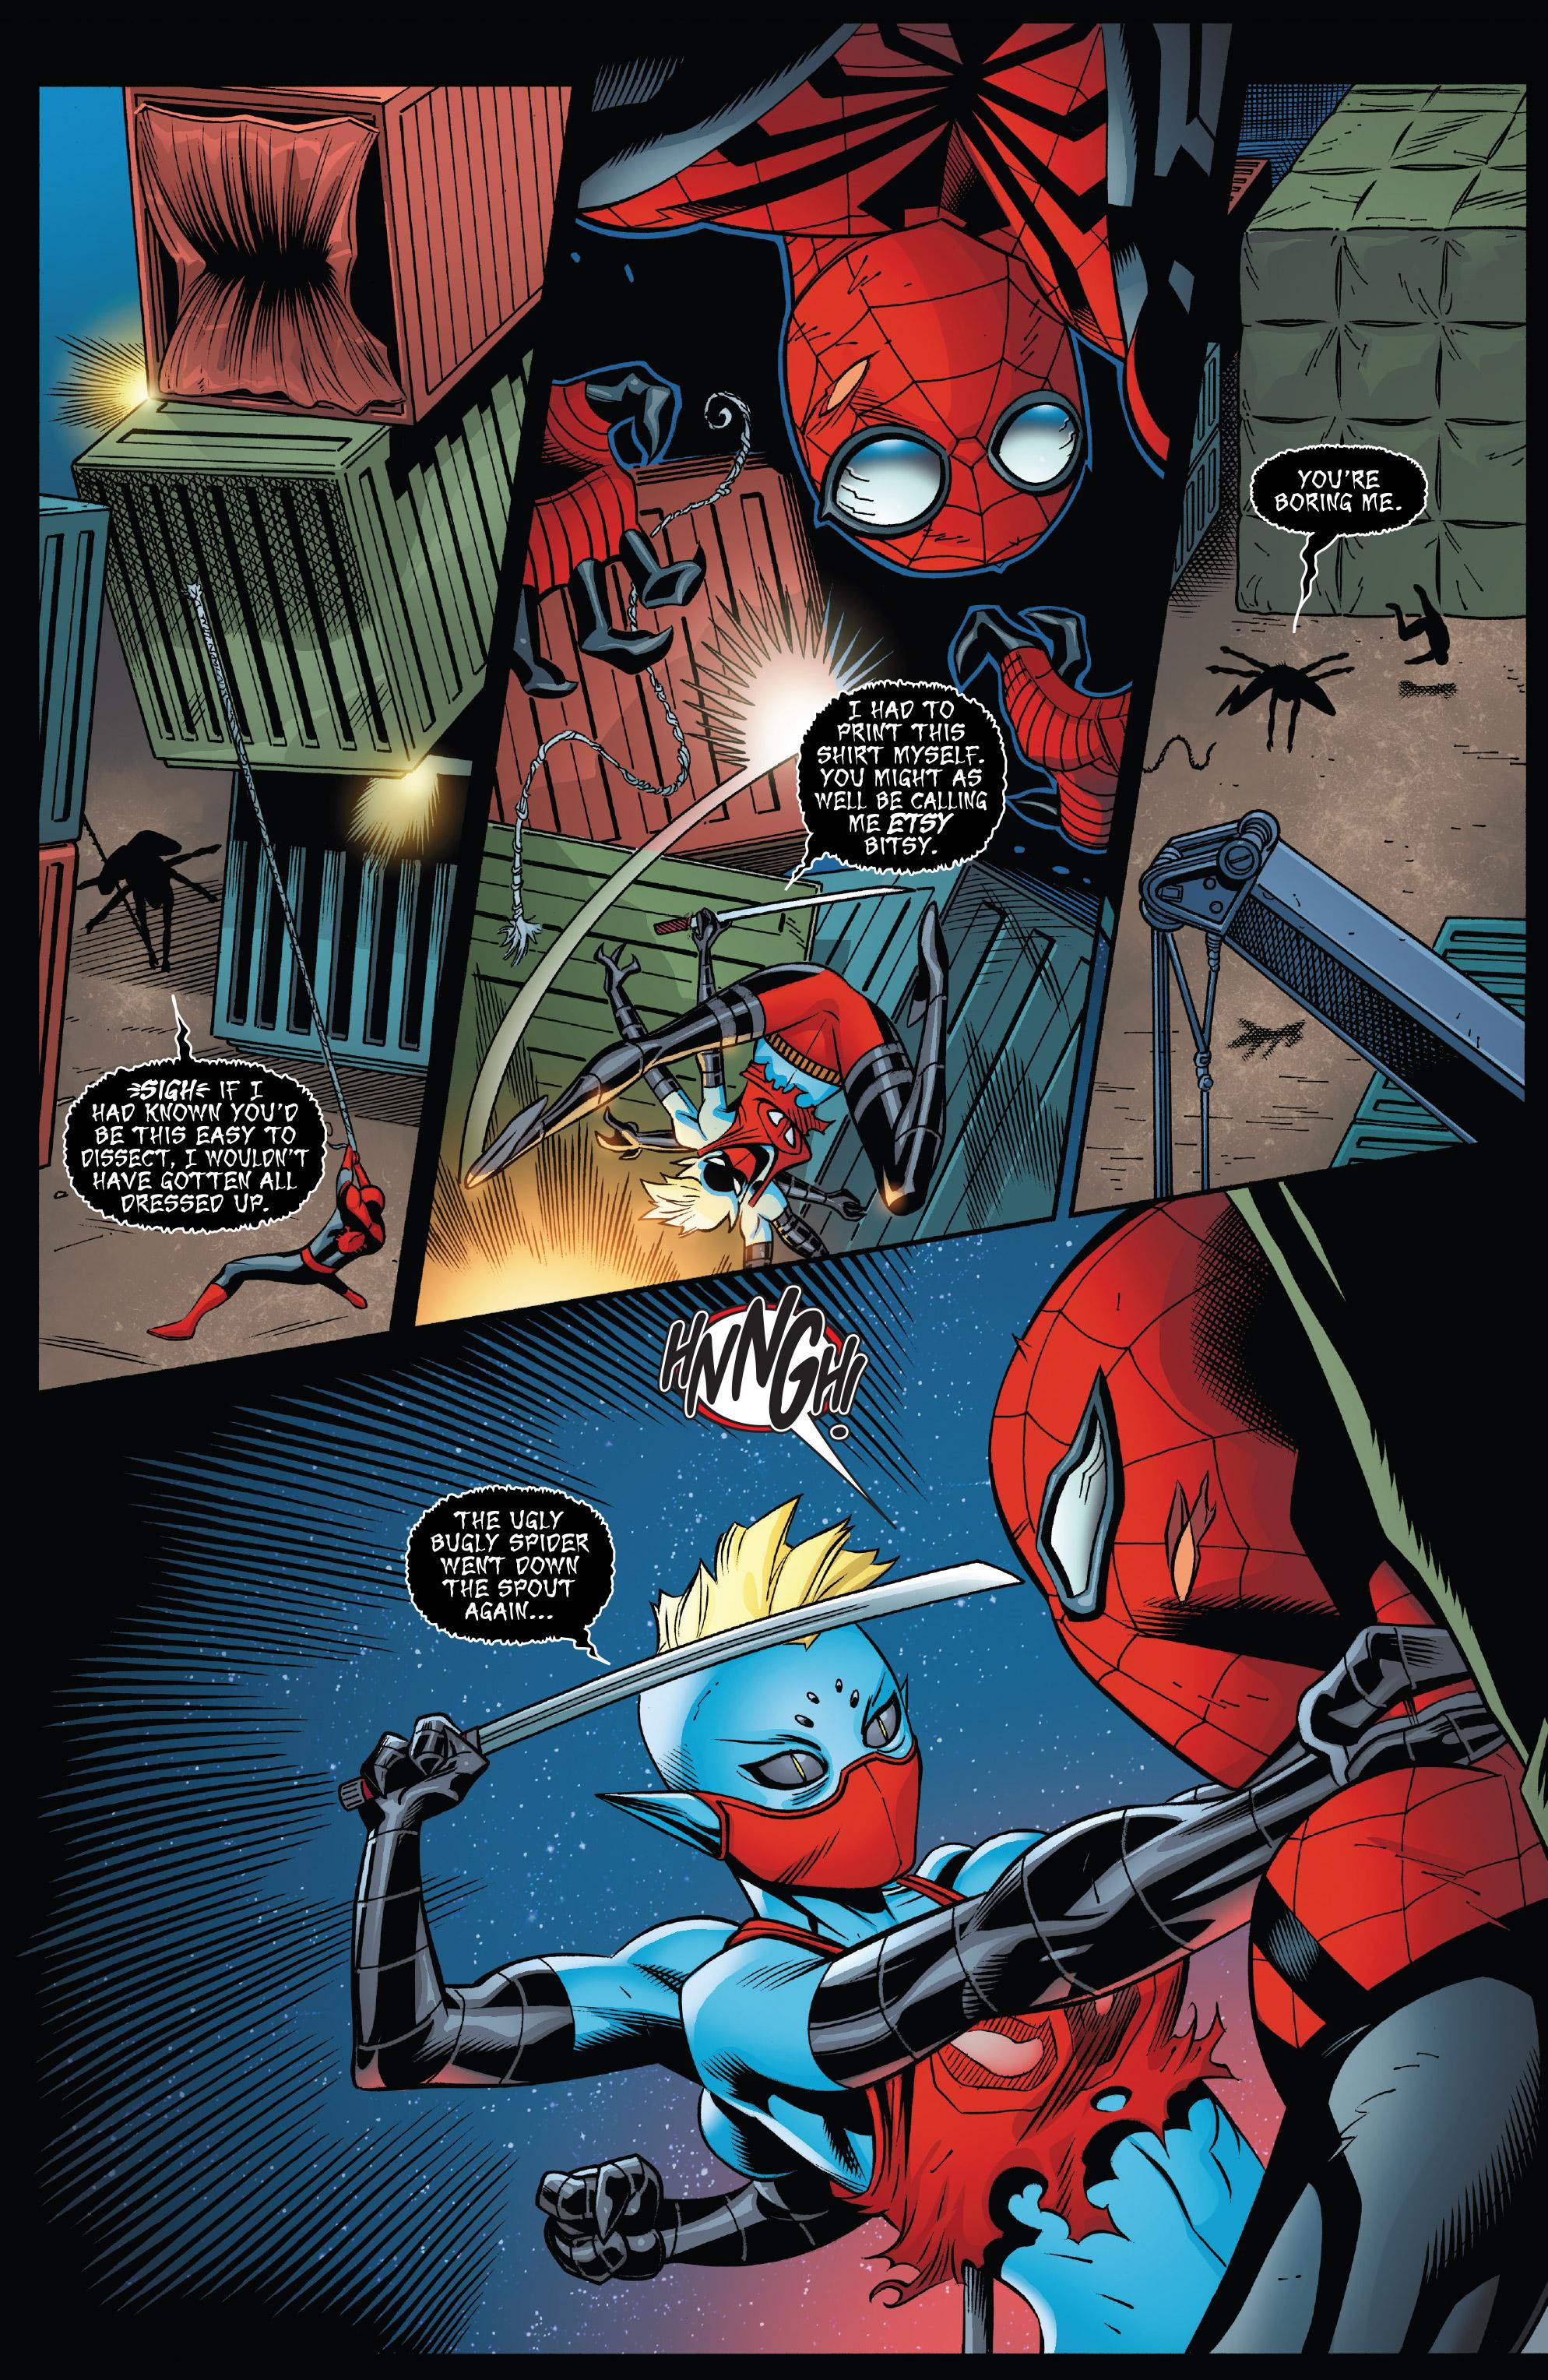 Read online Spider-Man/Deadpool comic -  Issue #17 - 13